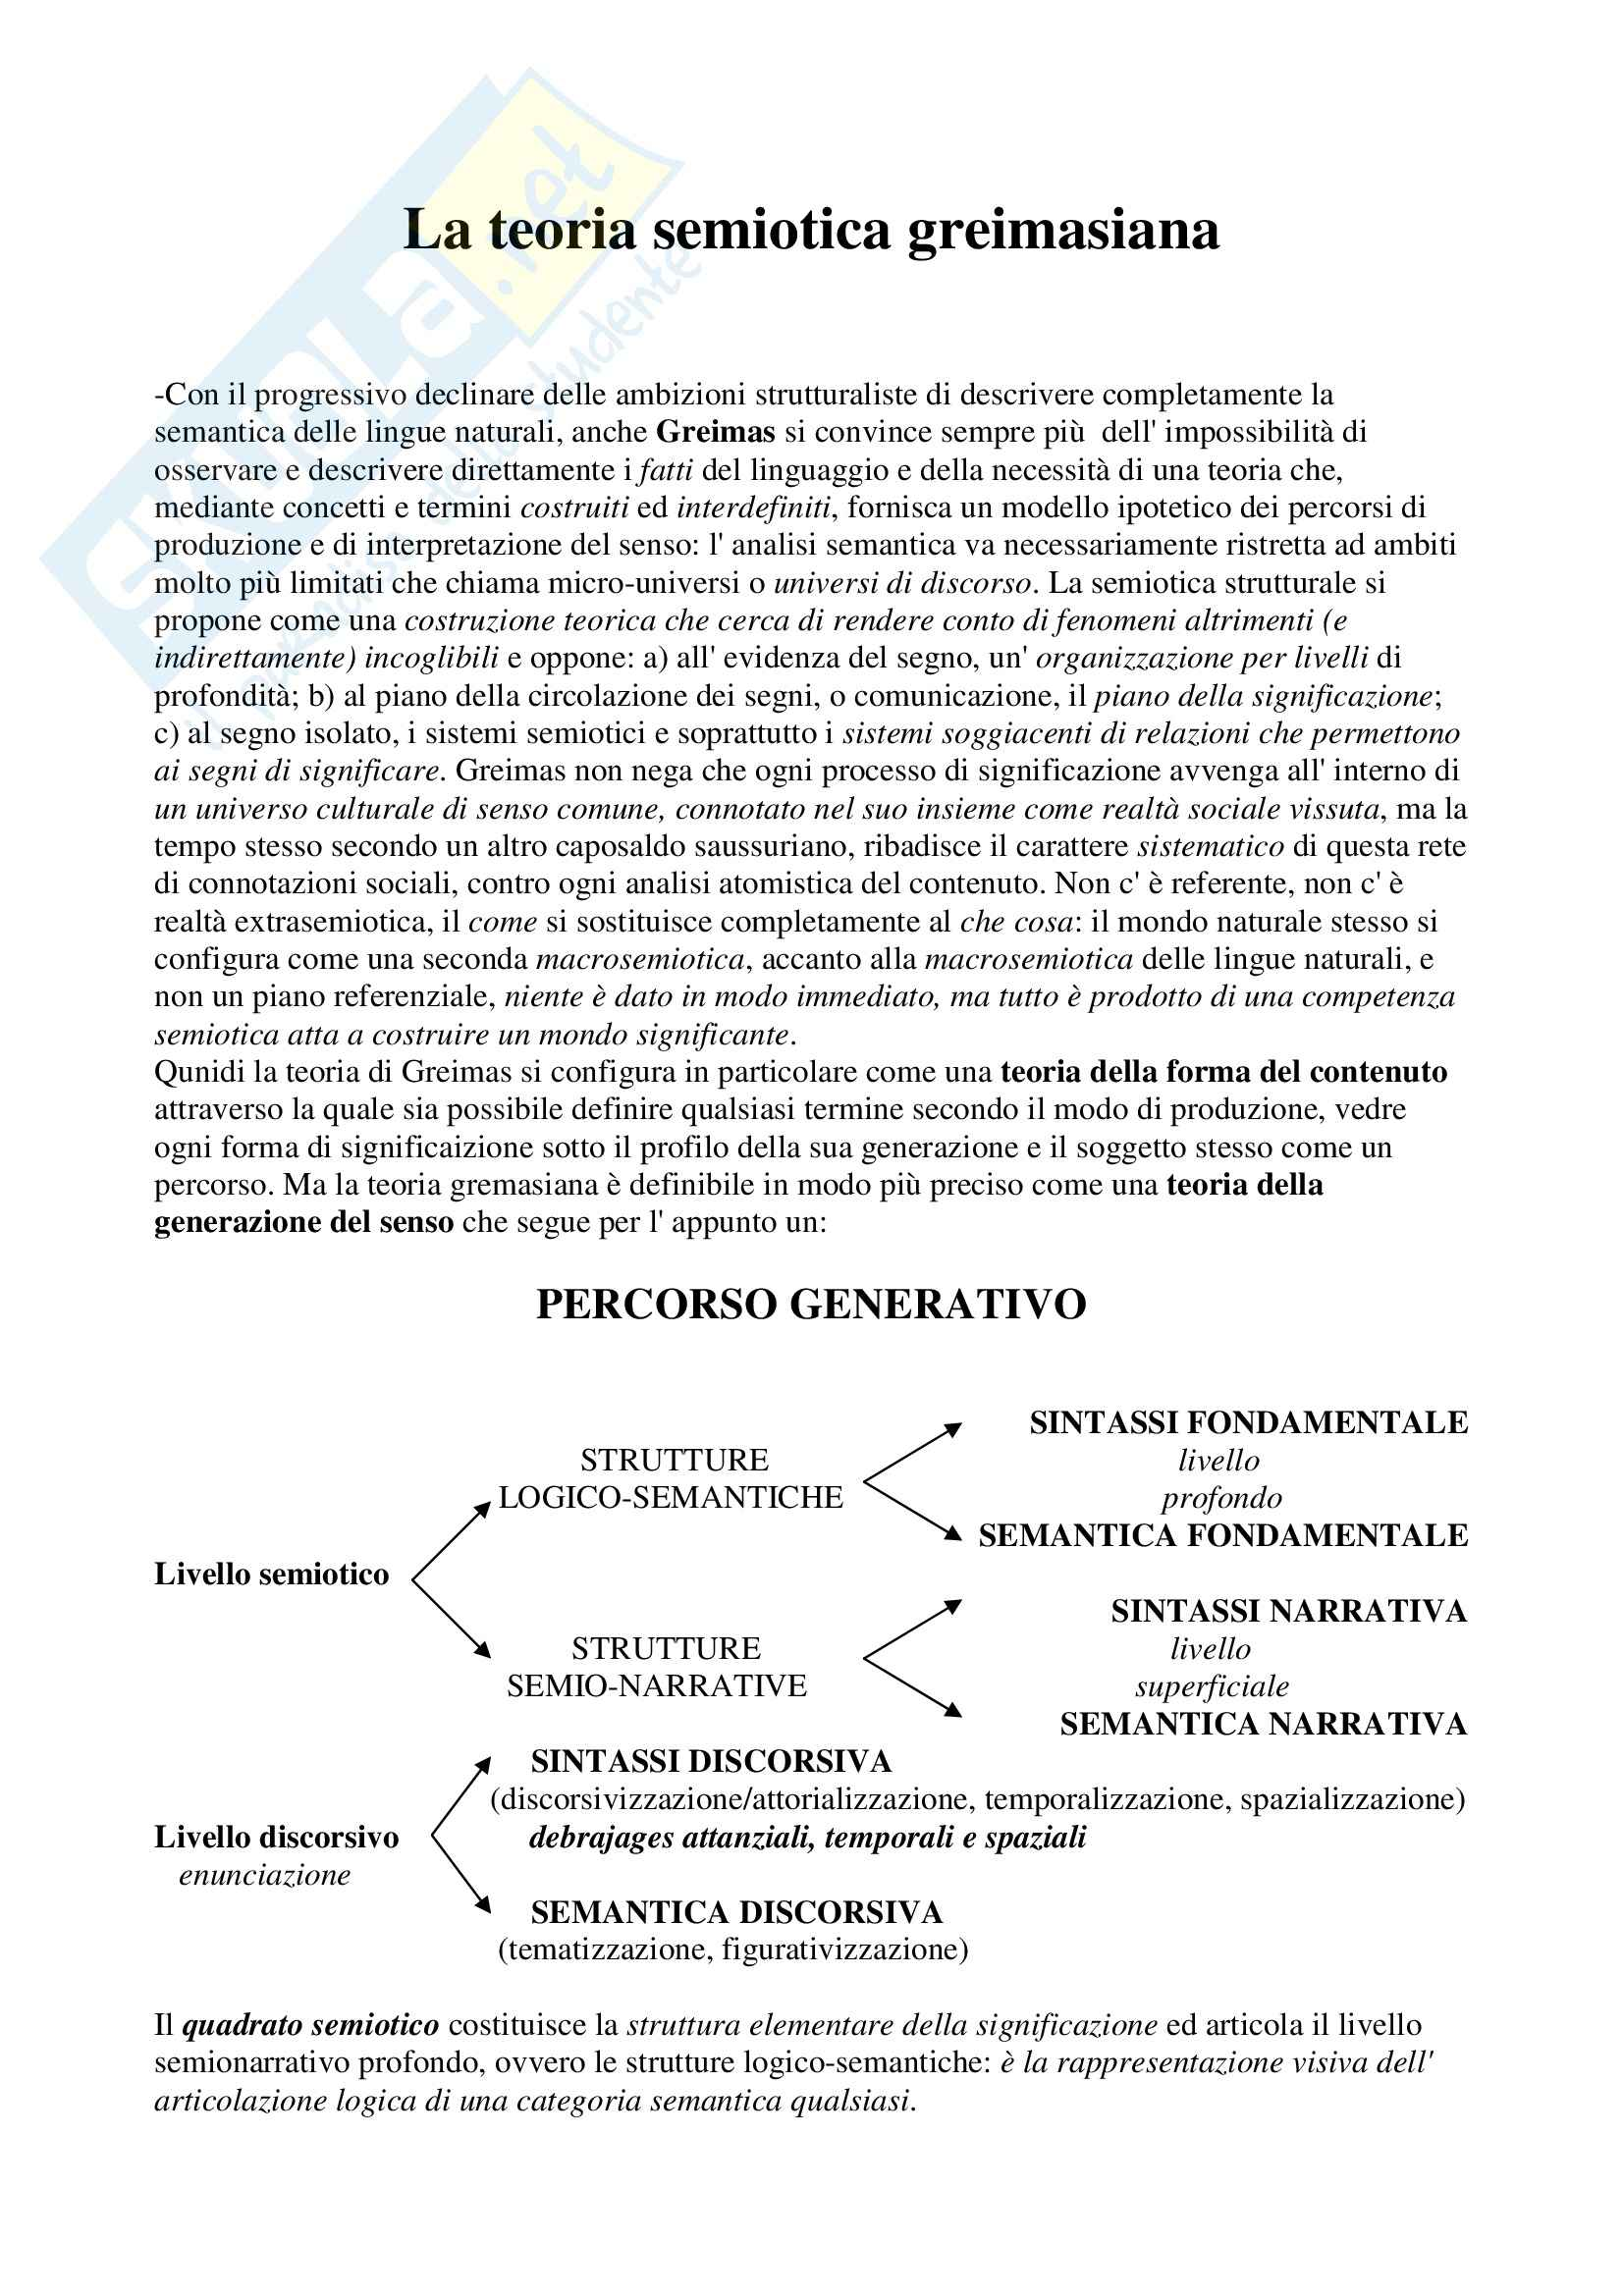 Semiotica - la teoria semiotica greimasiana